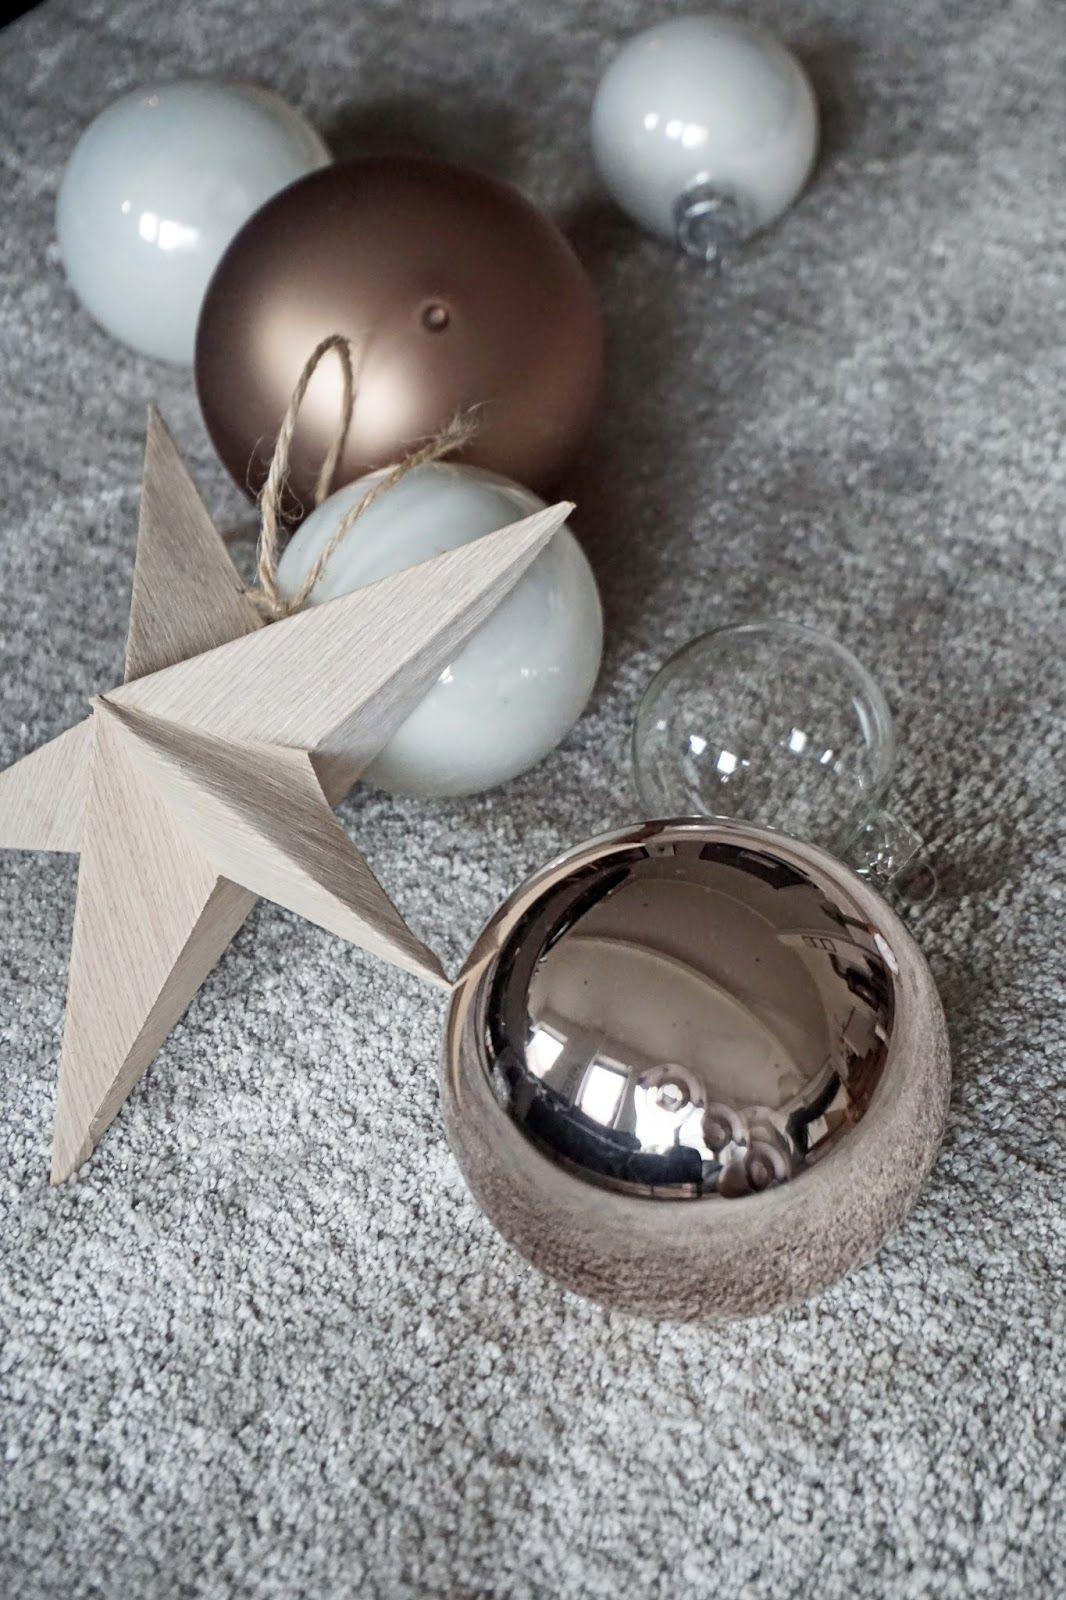 Weihnachtsbeleuchtung Tannenzapfen.Xmas Deluxe Kugeln Xmas Deluxe Weihnachtsdeko